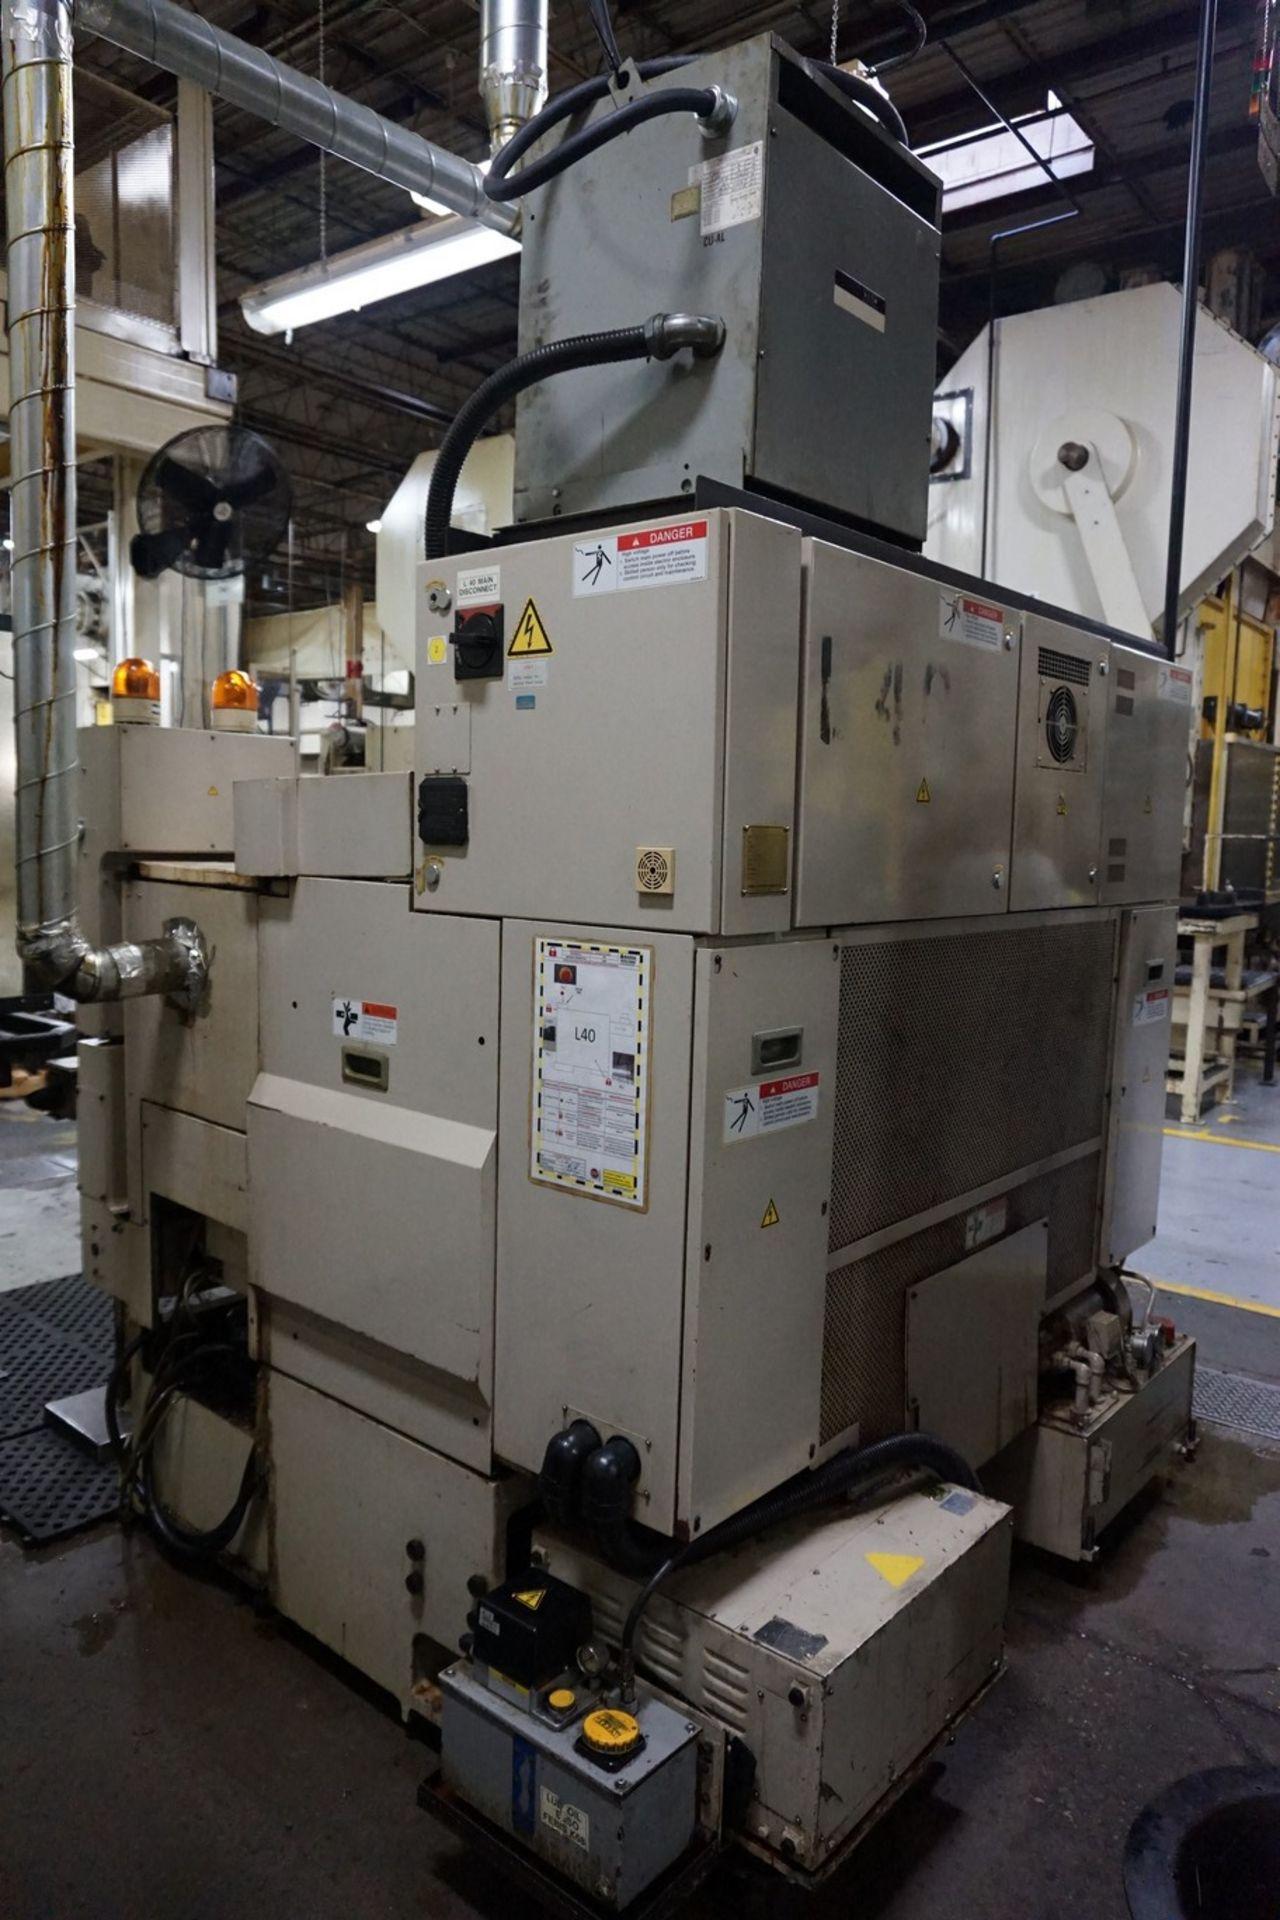 Okuma-Howa Model 2SP-15H CNC Lathe c/w Fanuc 18-TT Controller, Transformer - Image 5 of 6